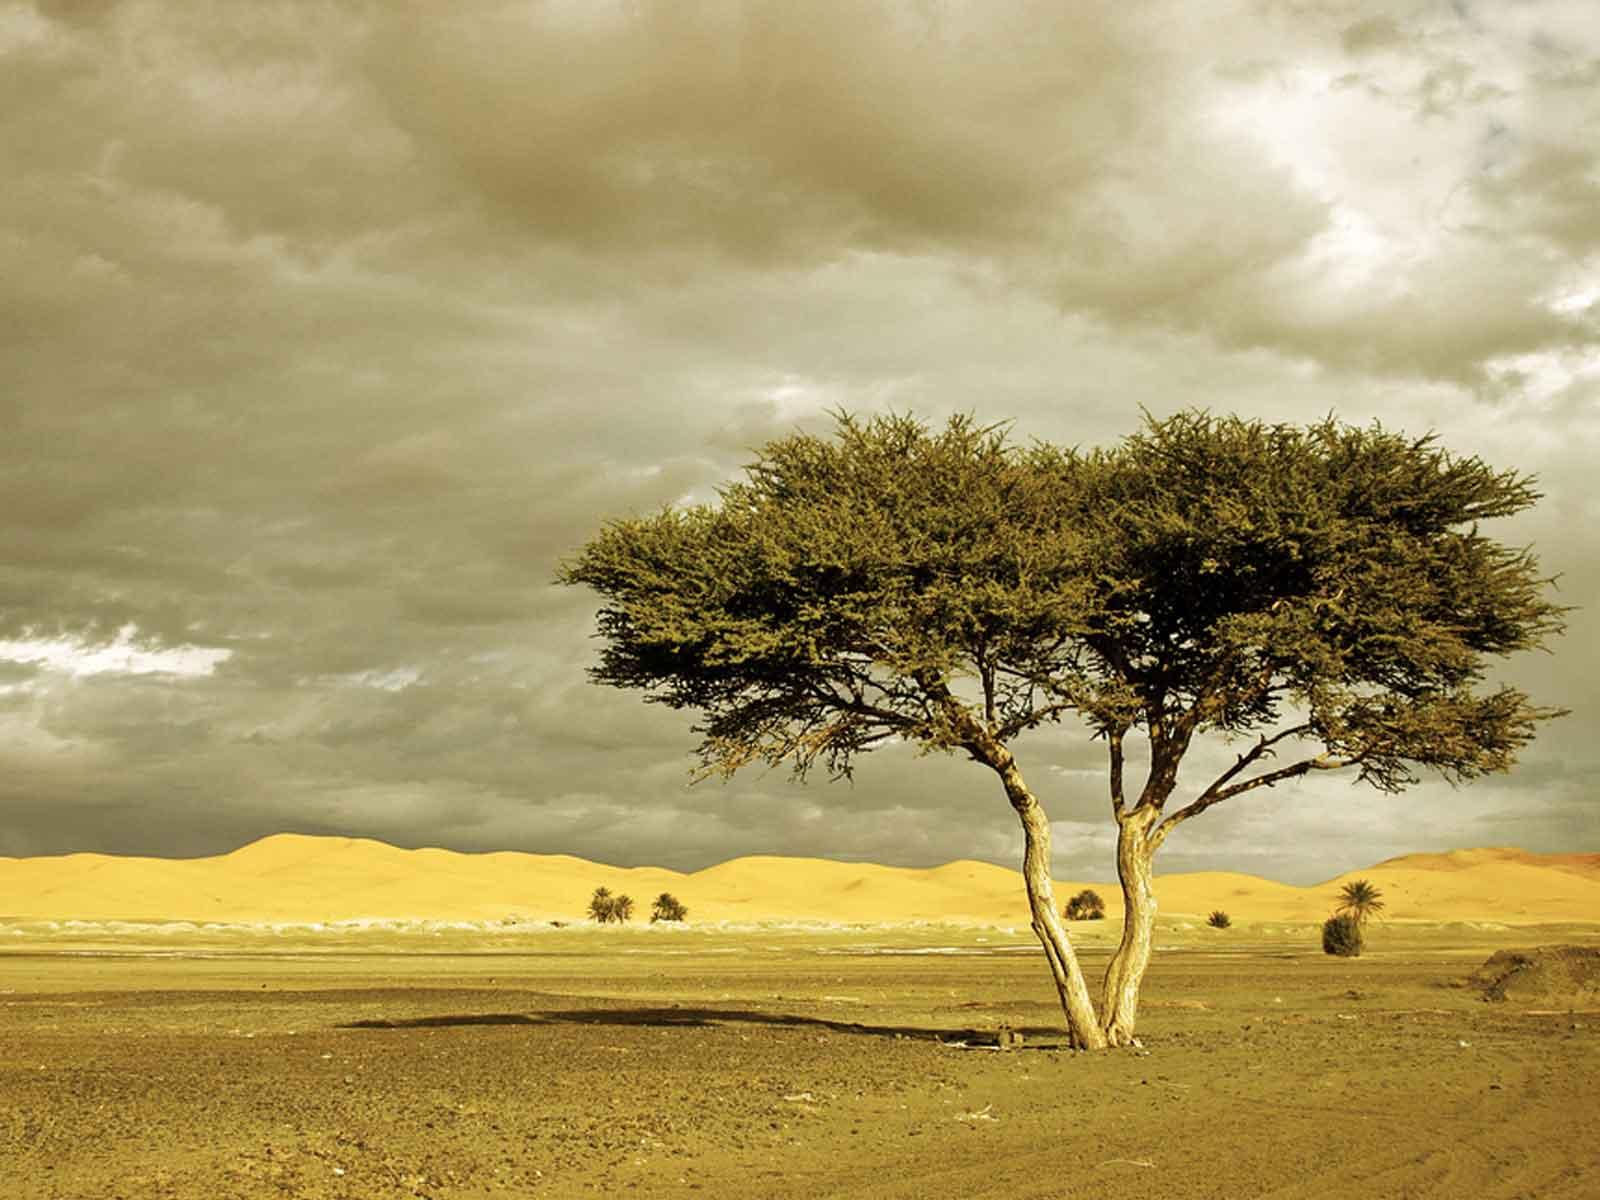 Marrakech Sahara desert tour 4 days to erg chigaga